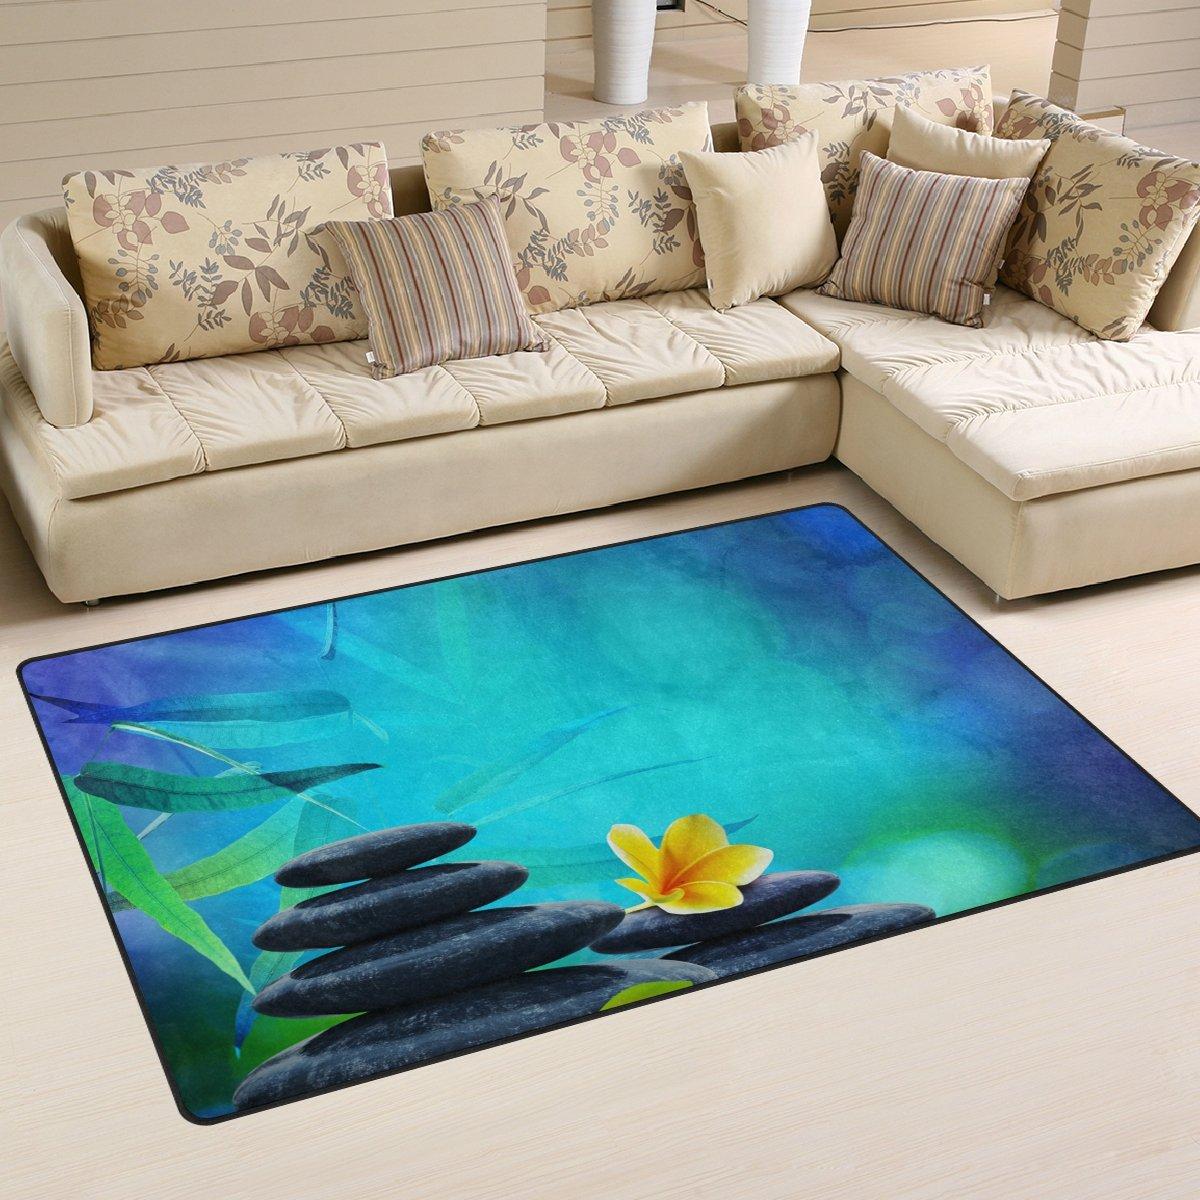 WellLee Area Rug,Dreamy Stones Leaves Floor Rug Non-Slip Doormat for Living Dining Dorm Room Bedroom Decor 60x39 inch